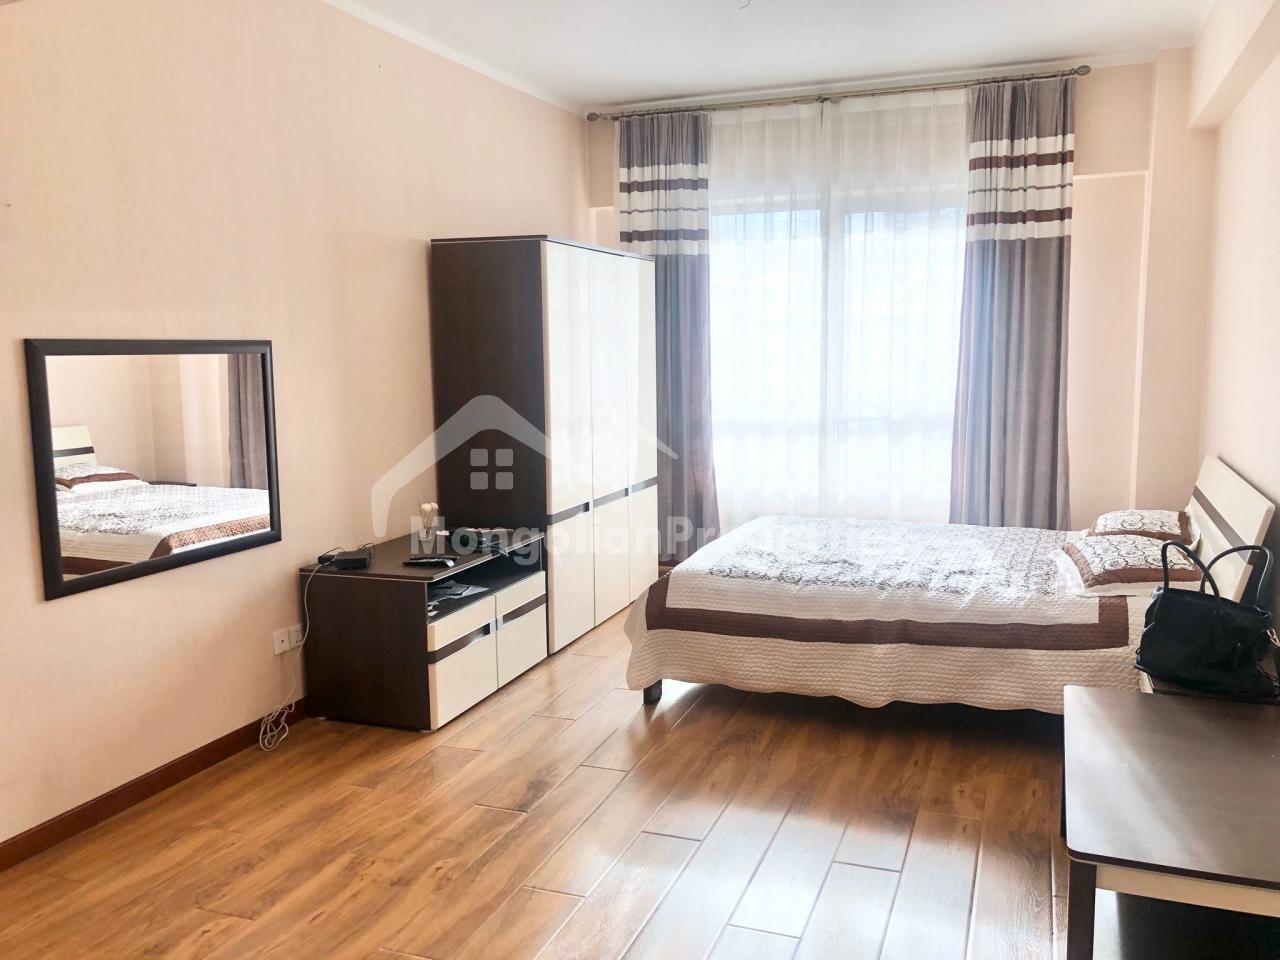 spacious 3 bedroom apartment for sale at Tescoma Zaisan